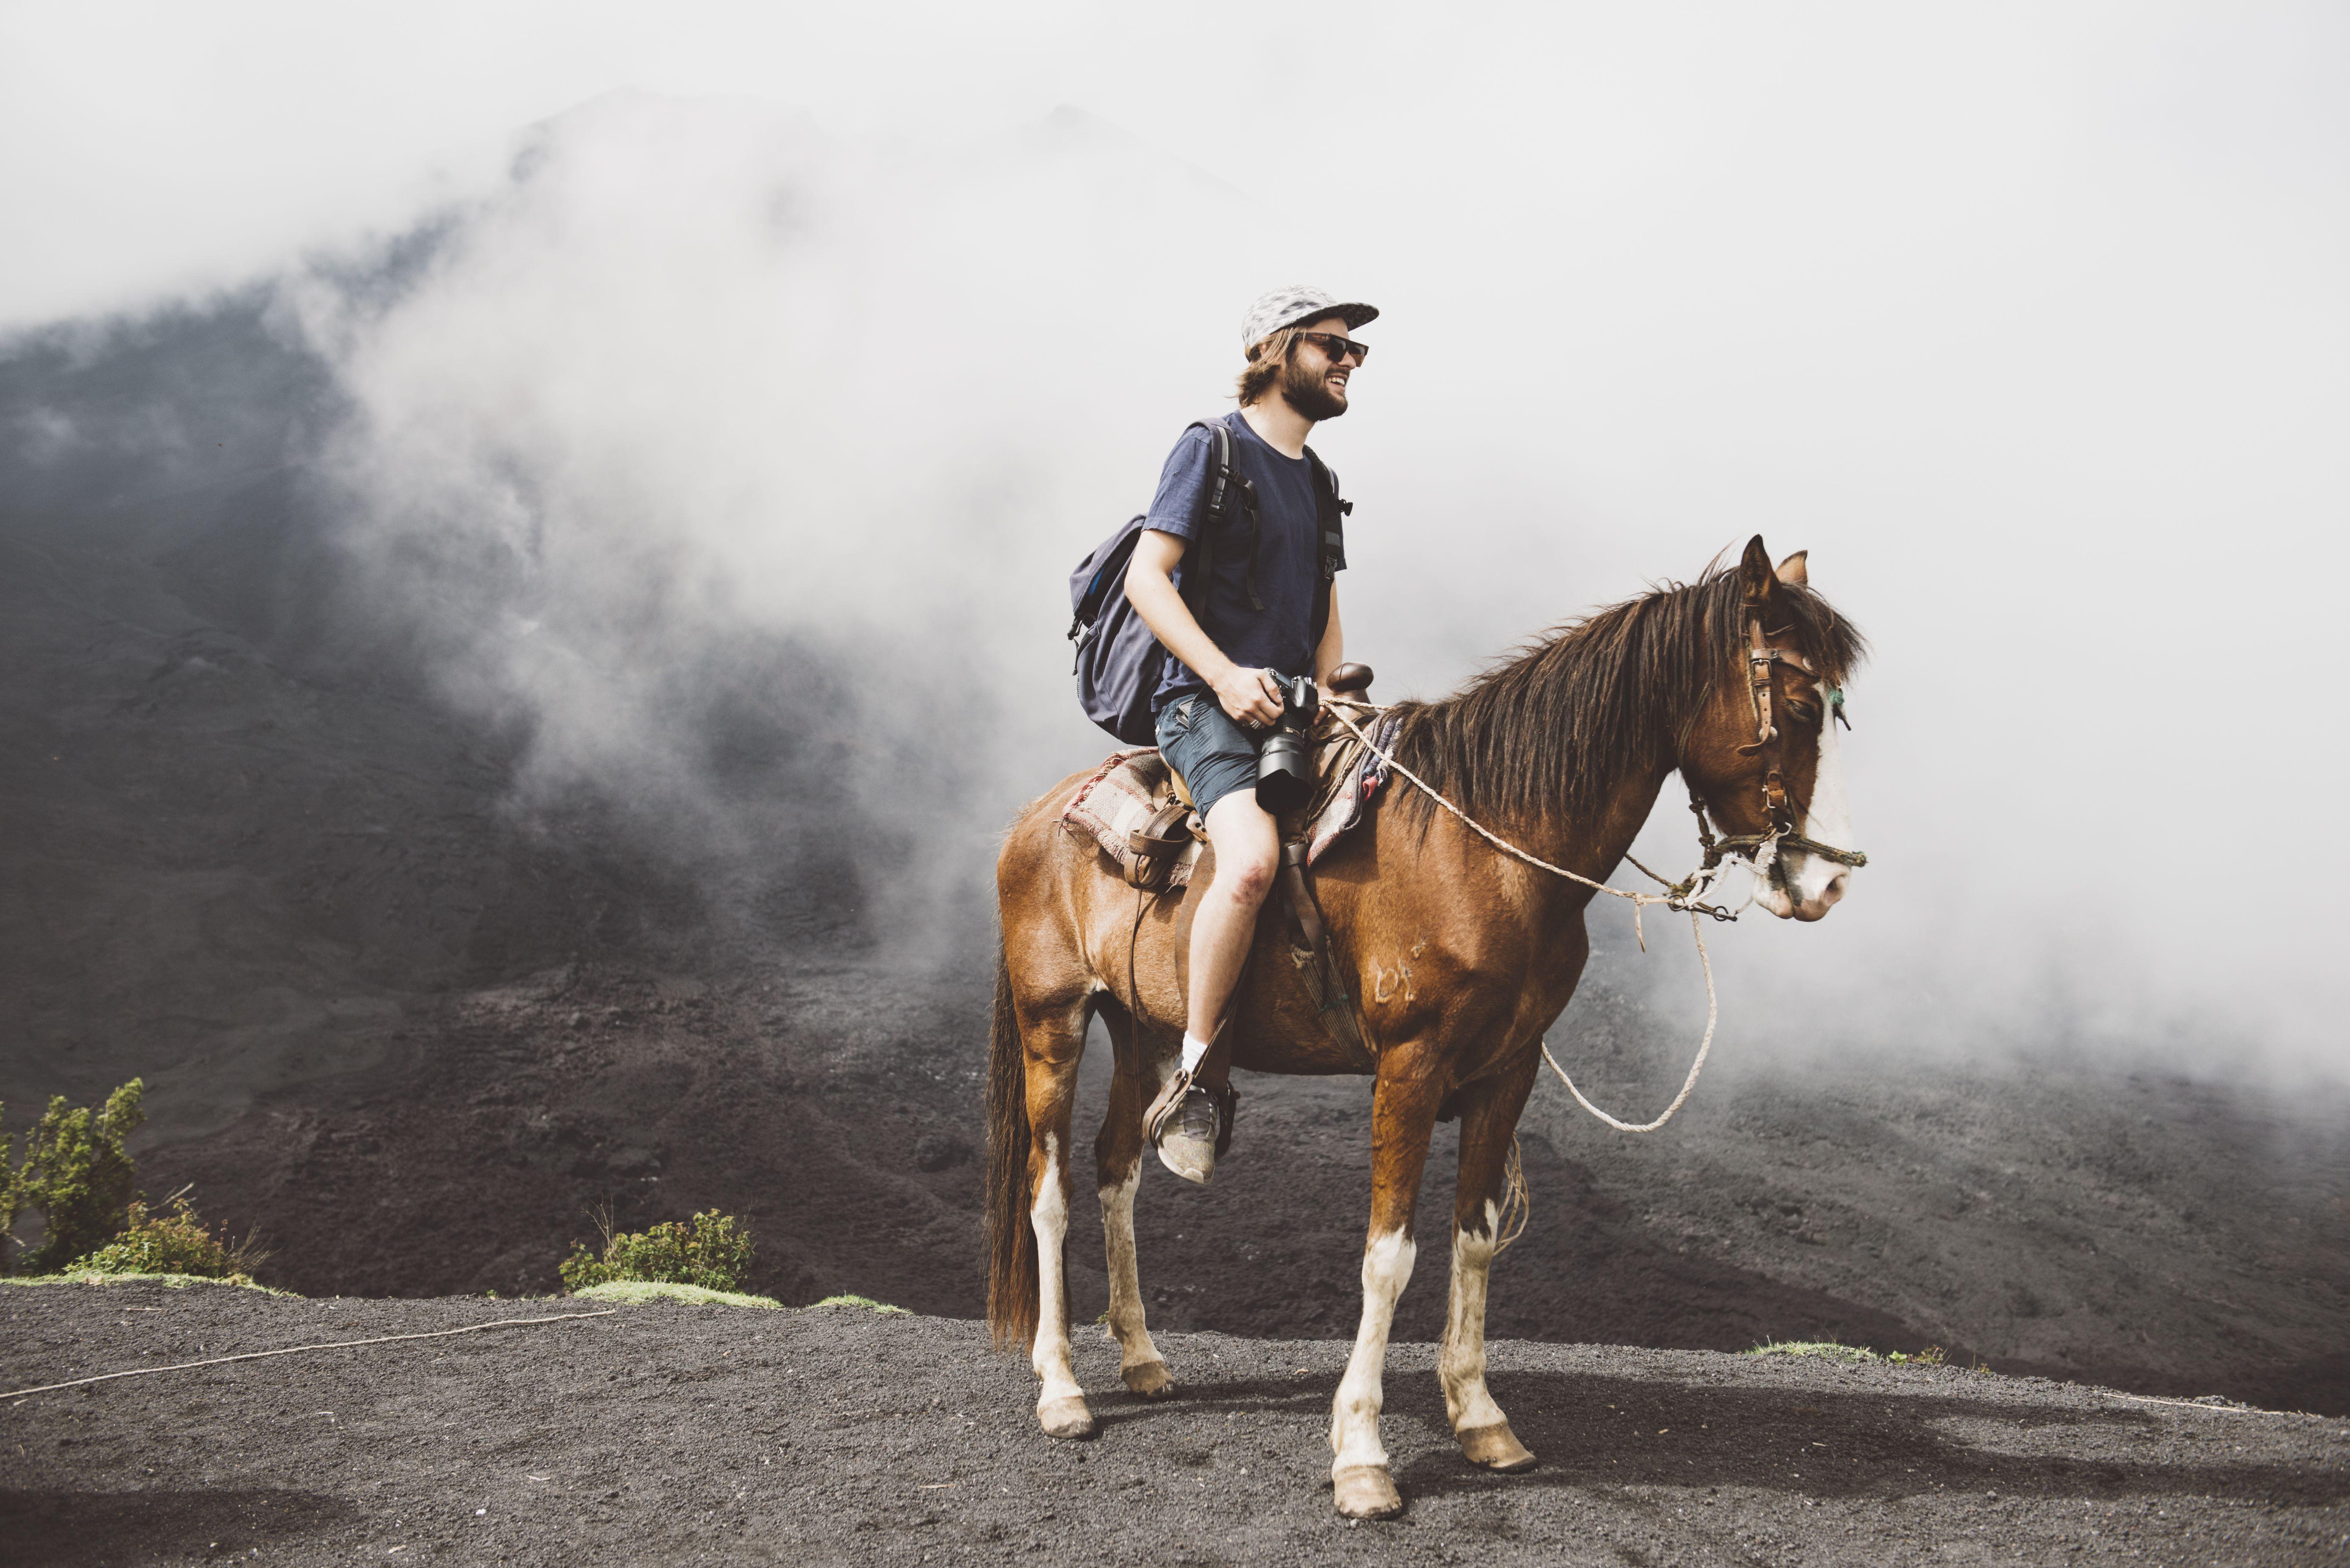 Hombre joven a caballo en el volcán Pacaya, Antigua, Guatemala